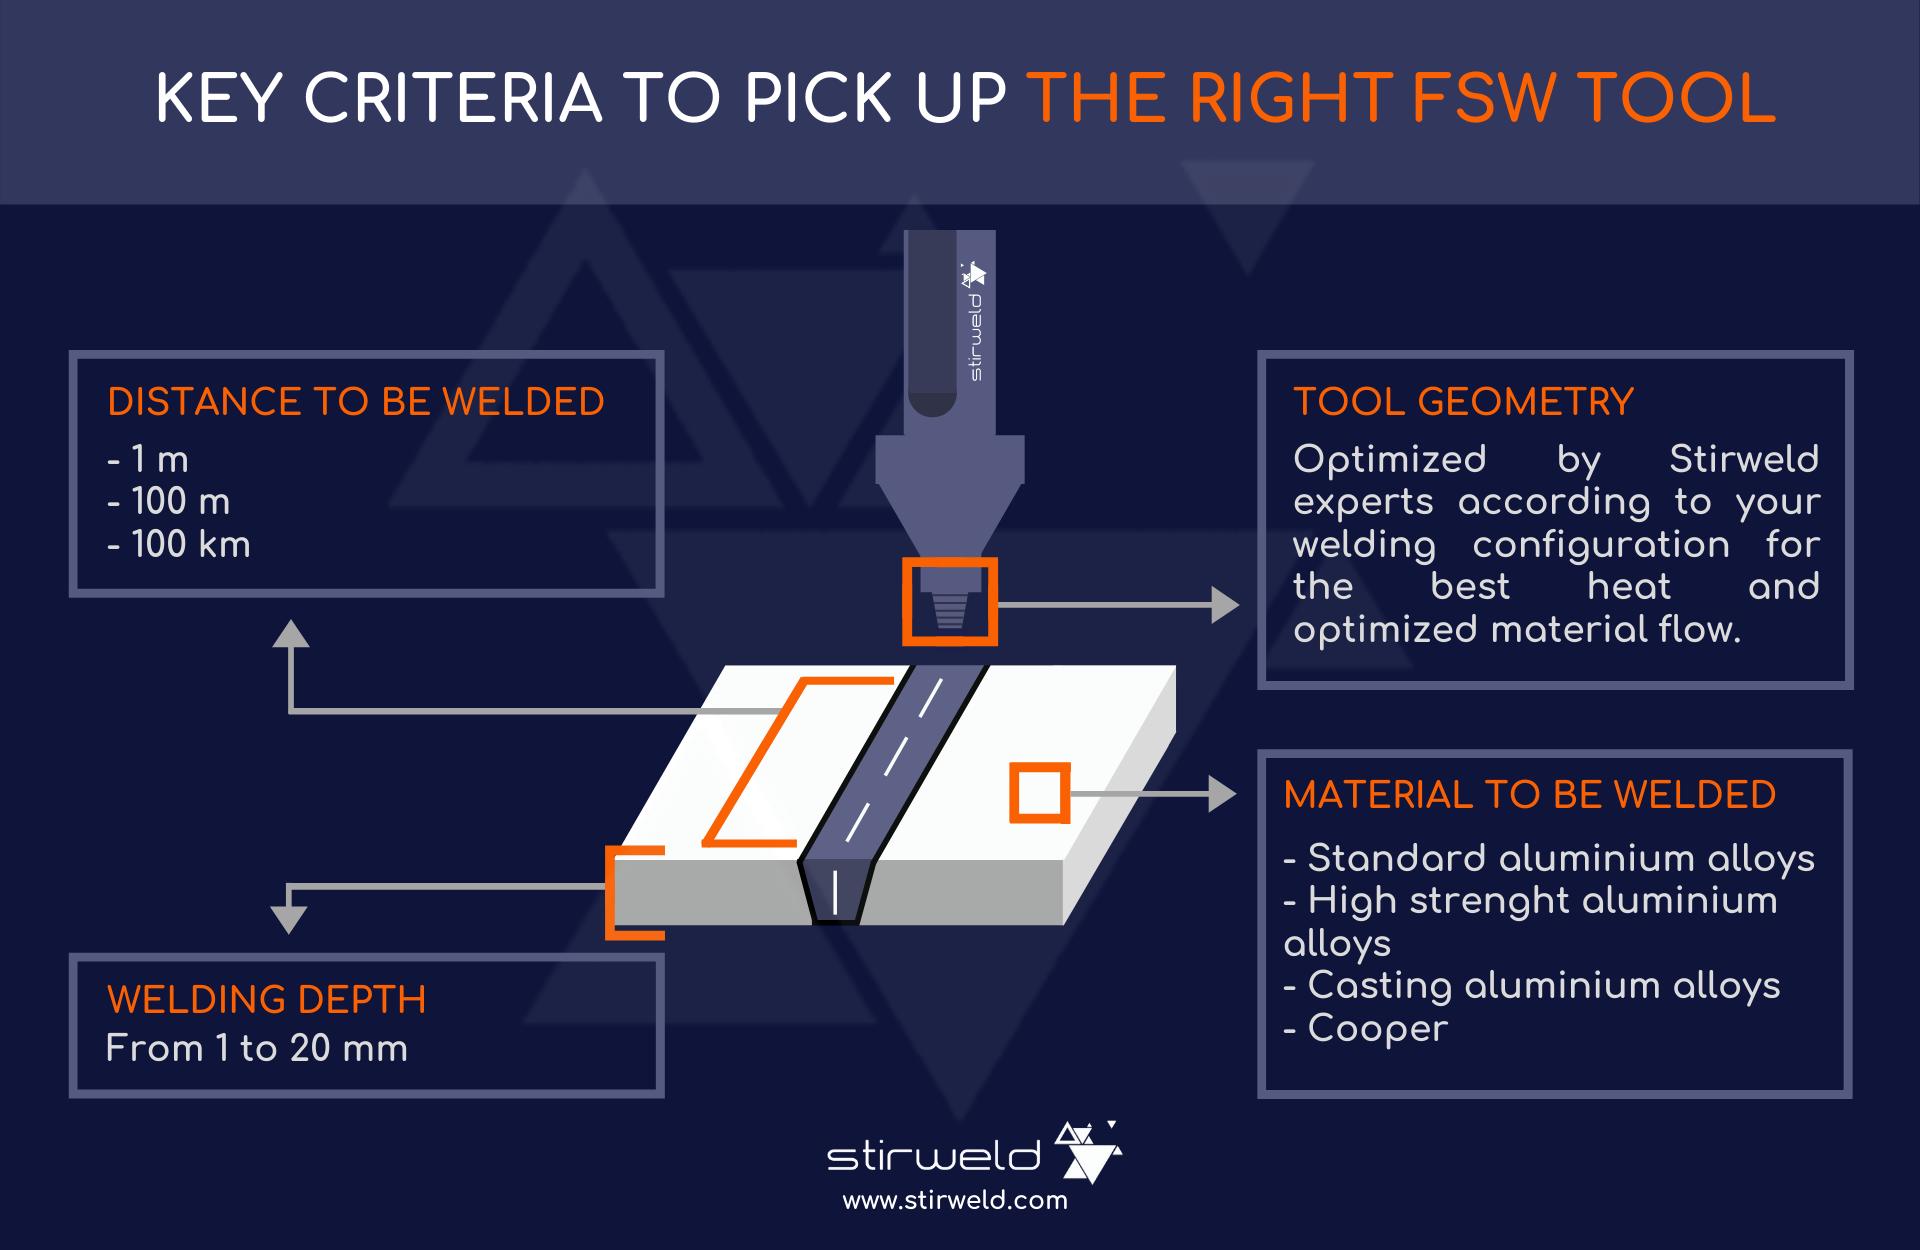 FSW tool: key criteria to pick up the right FSW tool